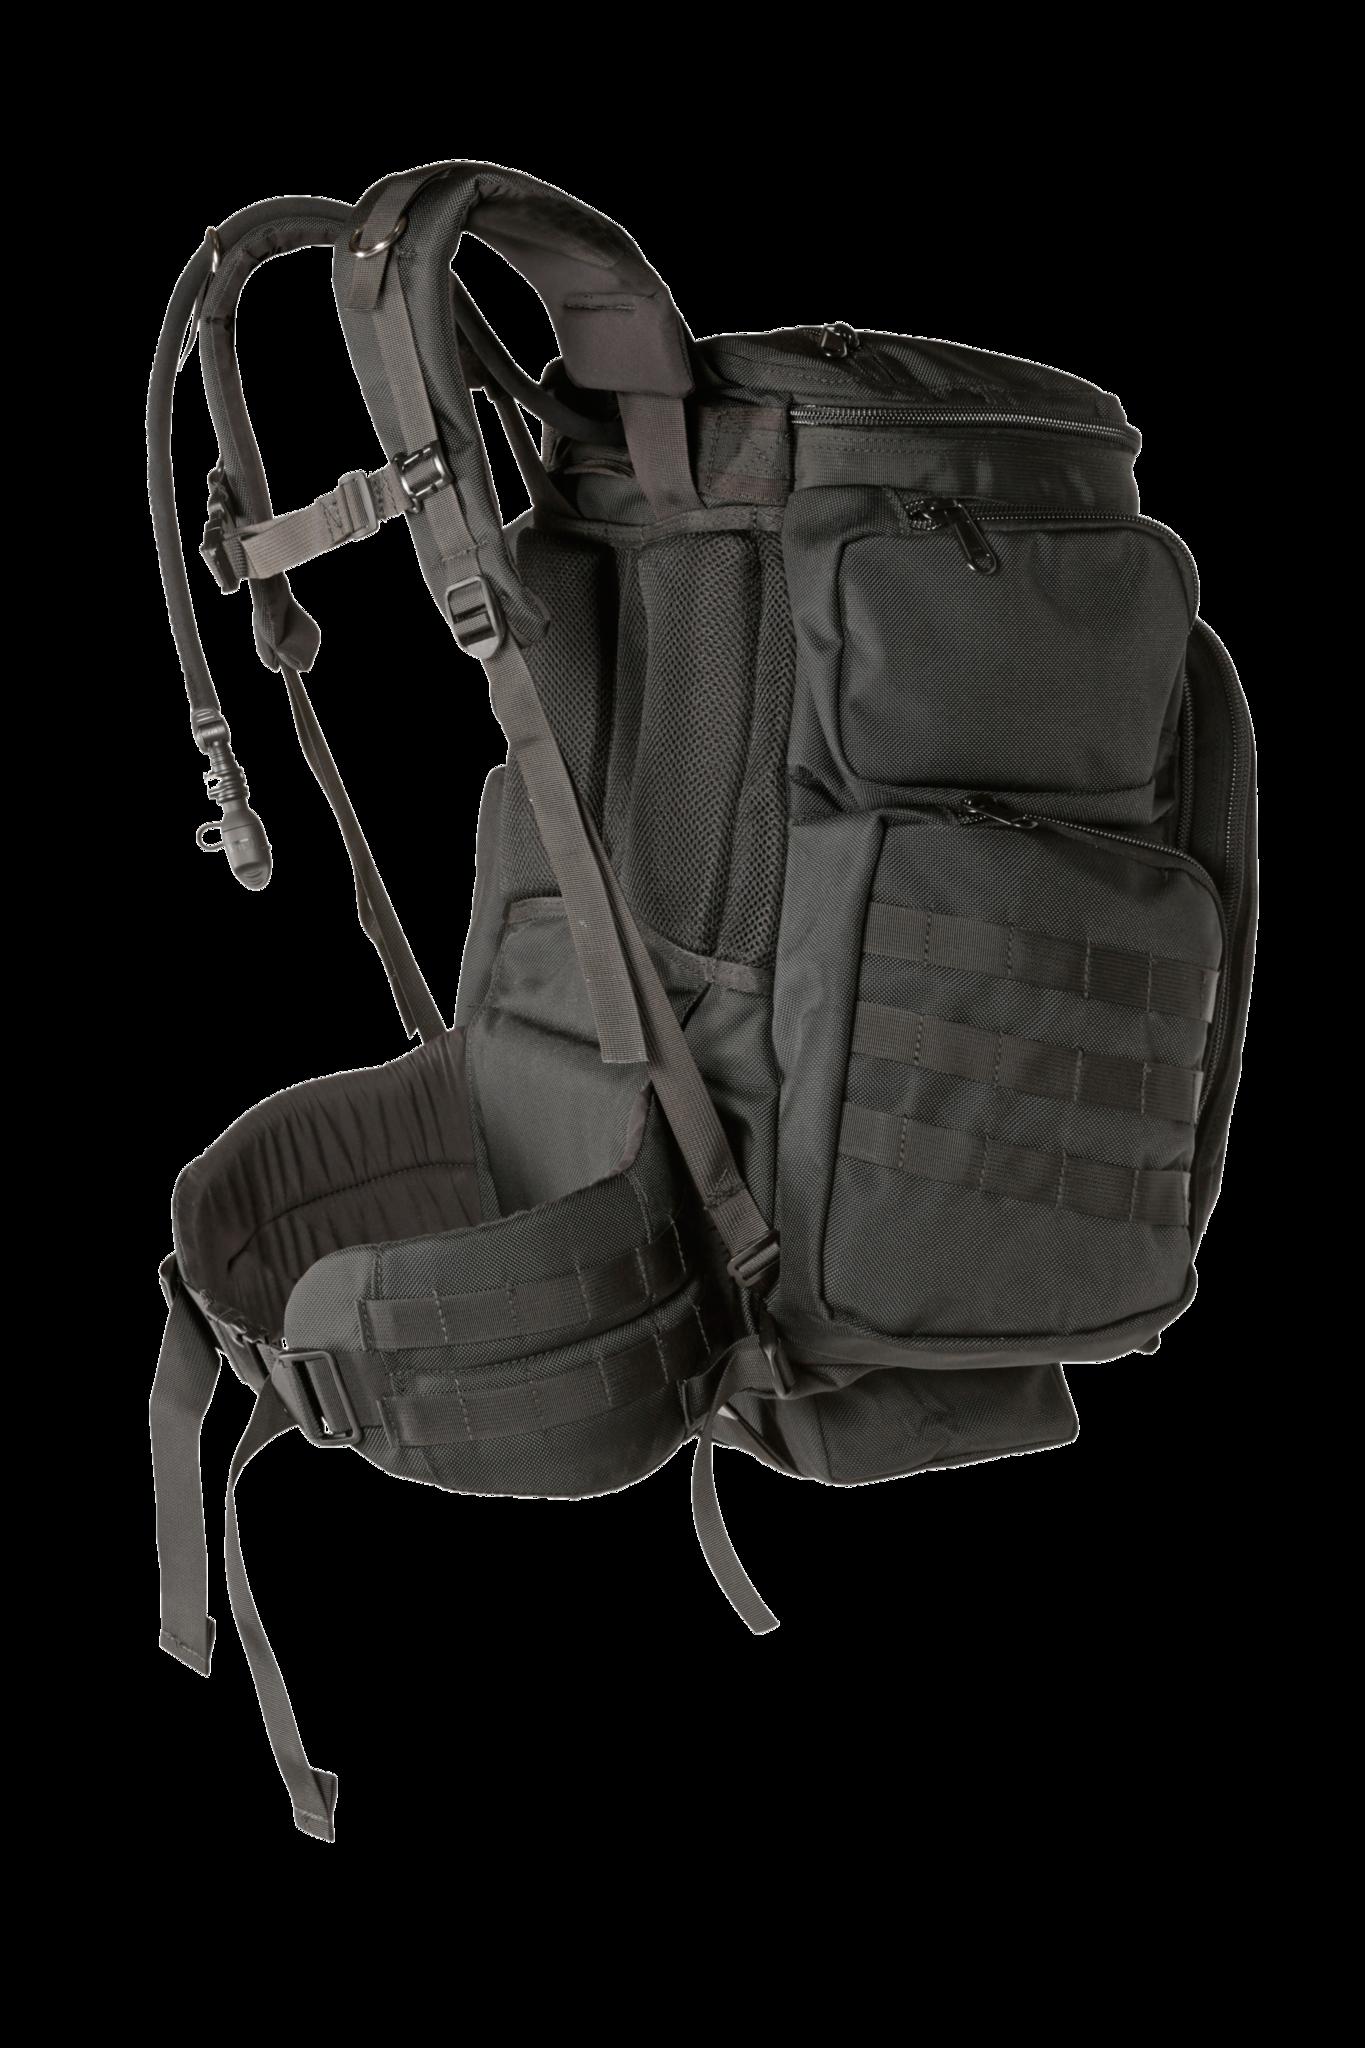 Wolfpack Gear Wolfpack Reaction Medic Pack